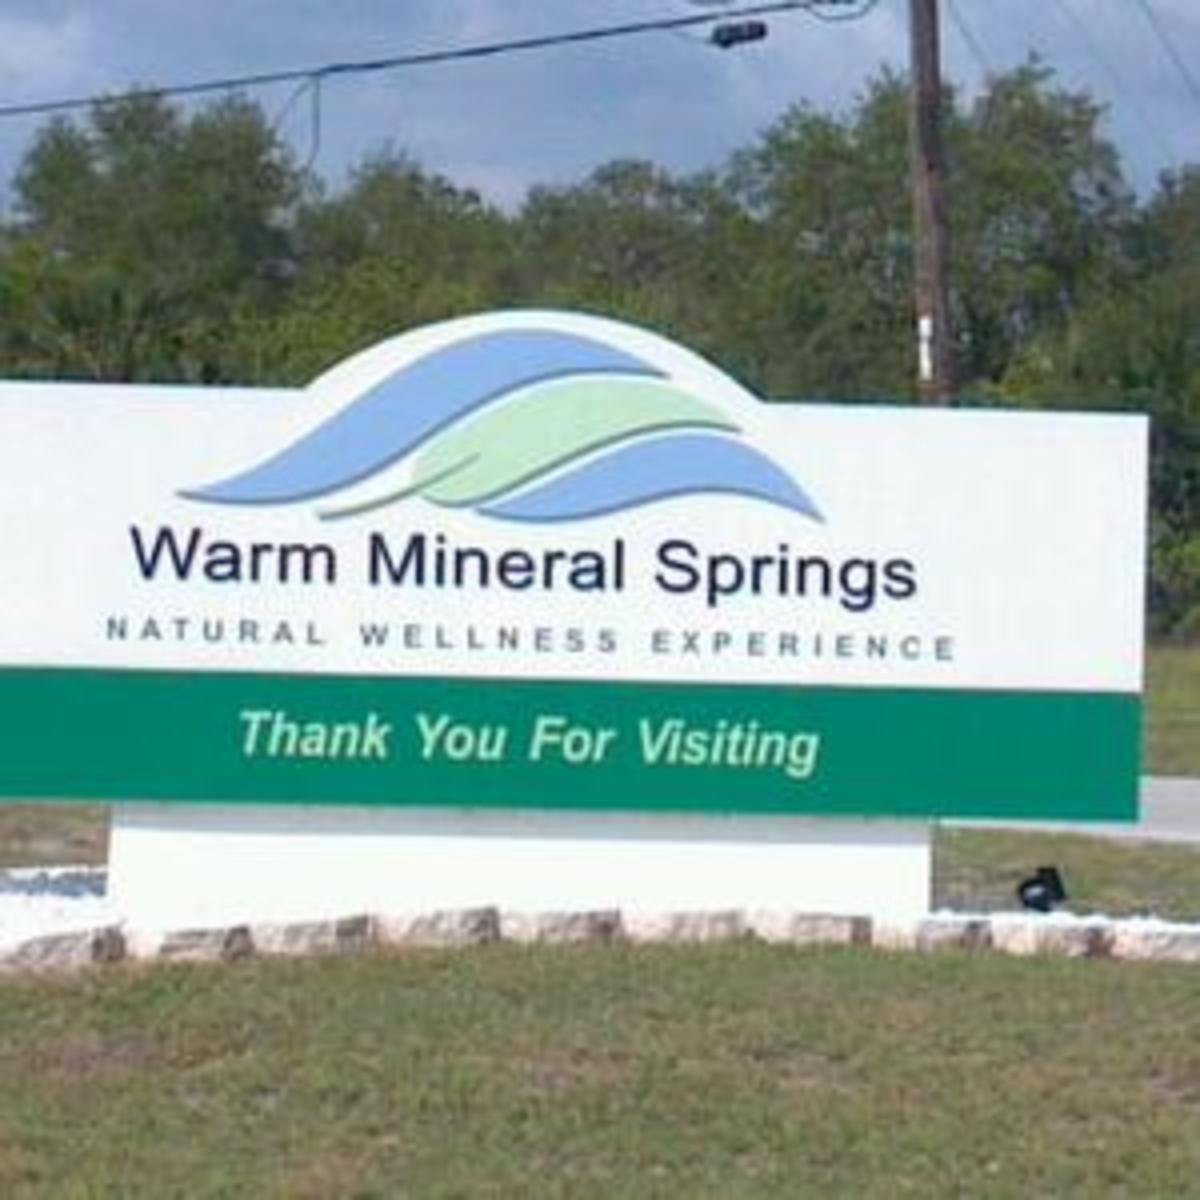 Warm Mineral Springs, North Port, Florida